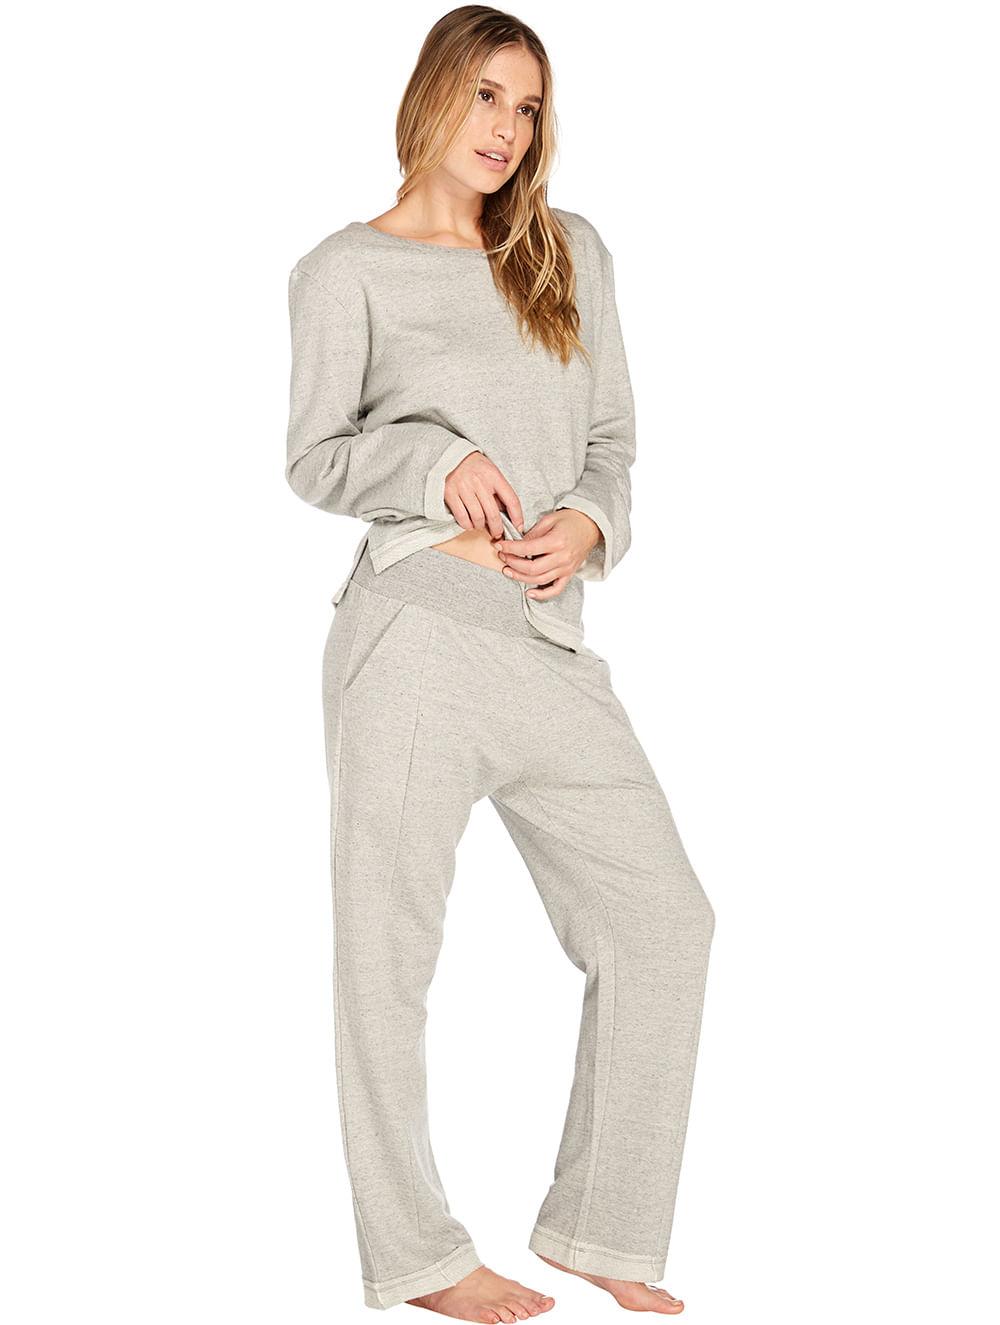 7c44f3c430 Camiseta Manga Longa e Calça Homewear - VALI-V-MOB